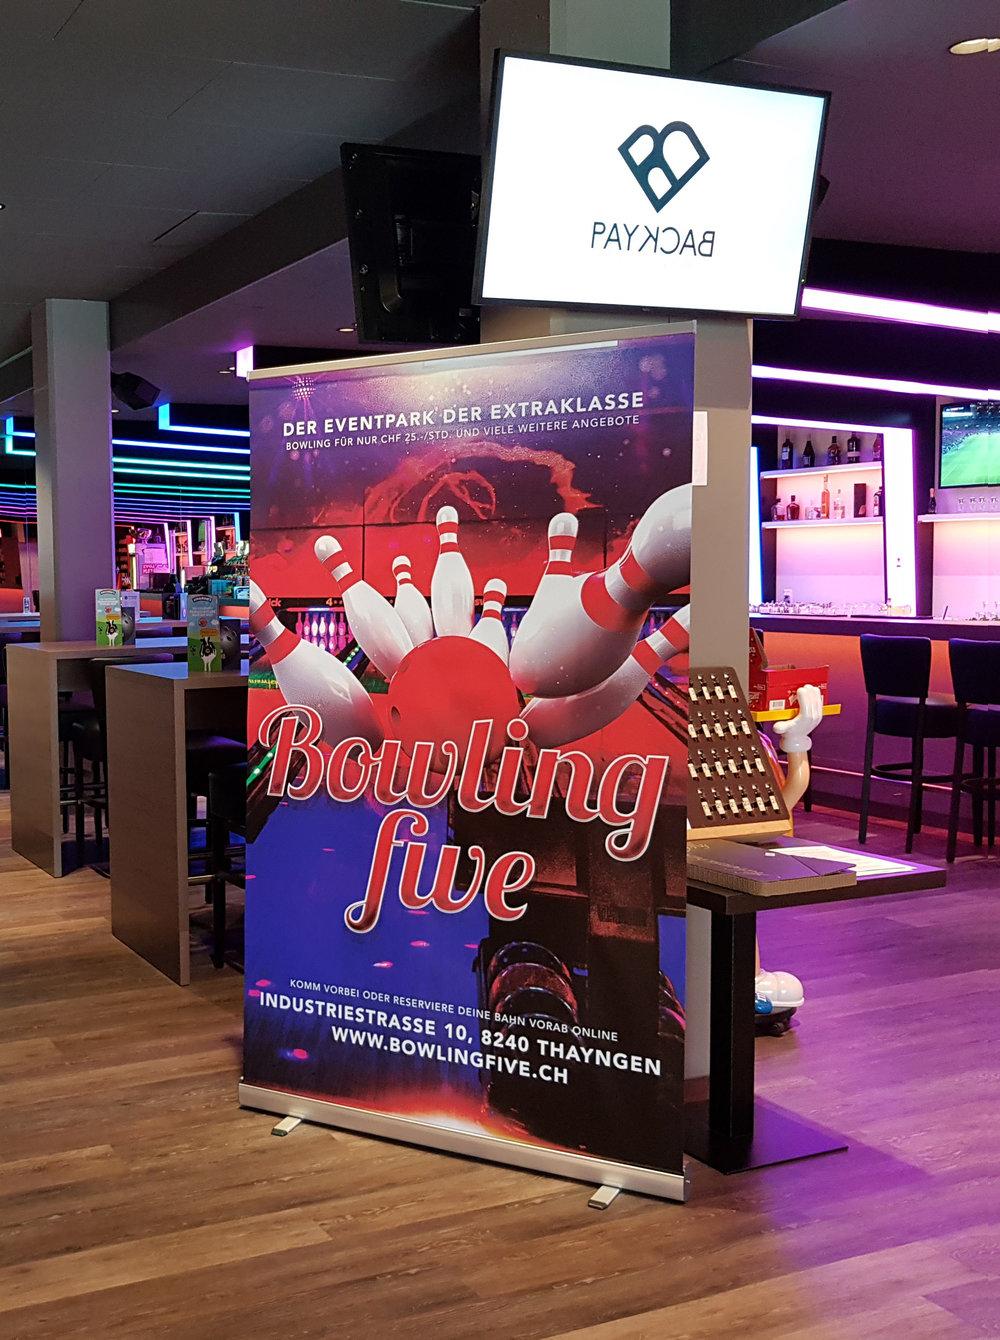 rollup-display-banner-200x120-bowlingfive.jpg